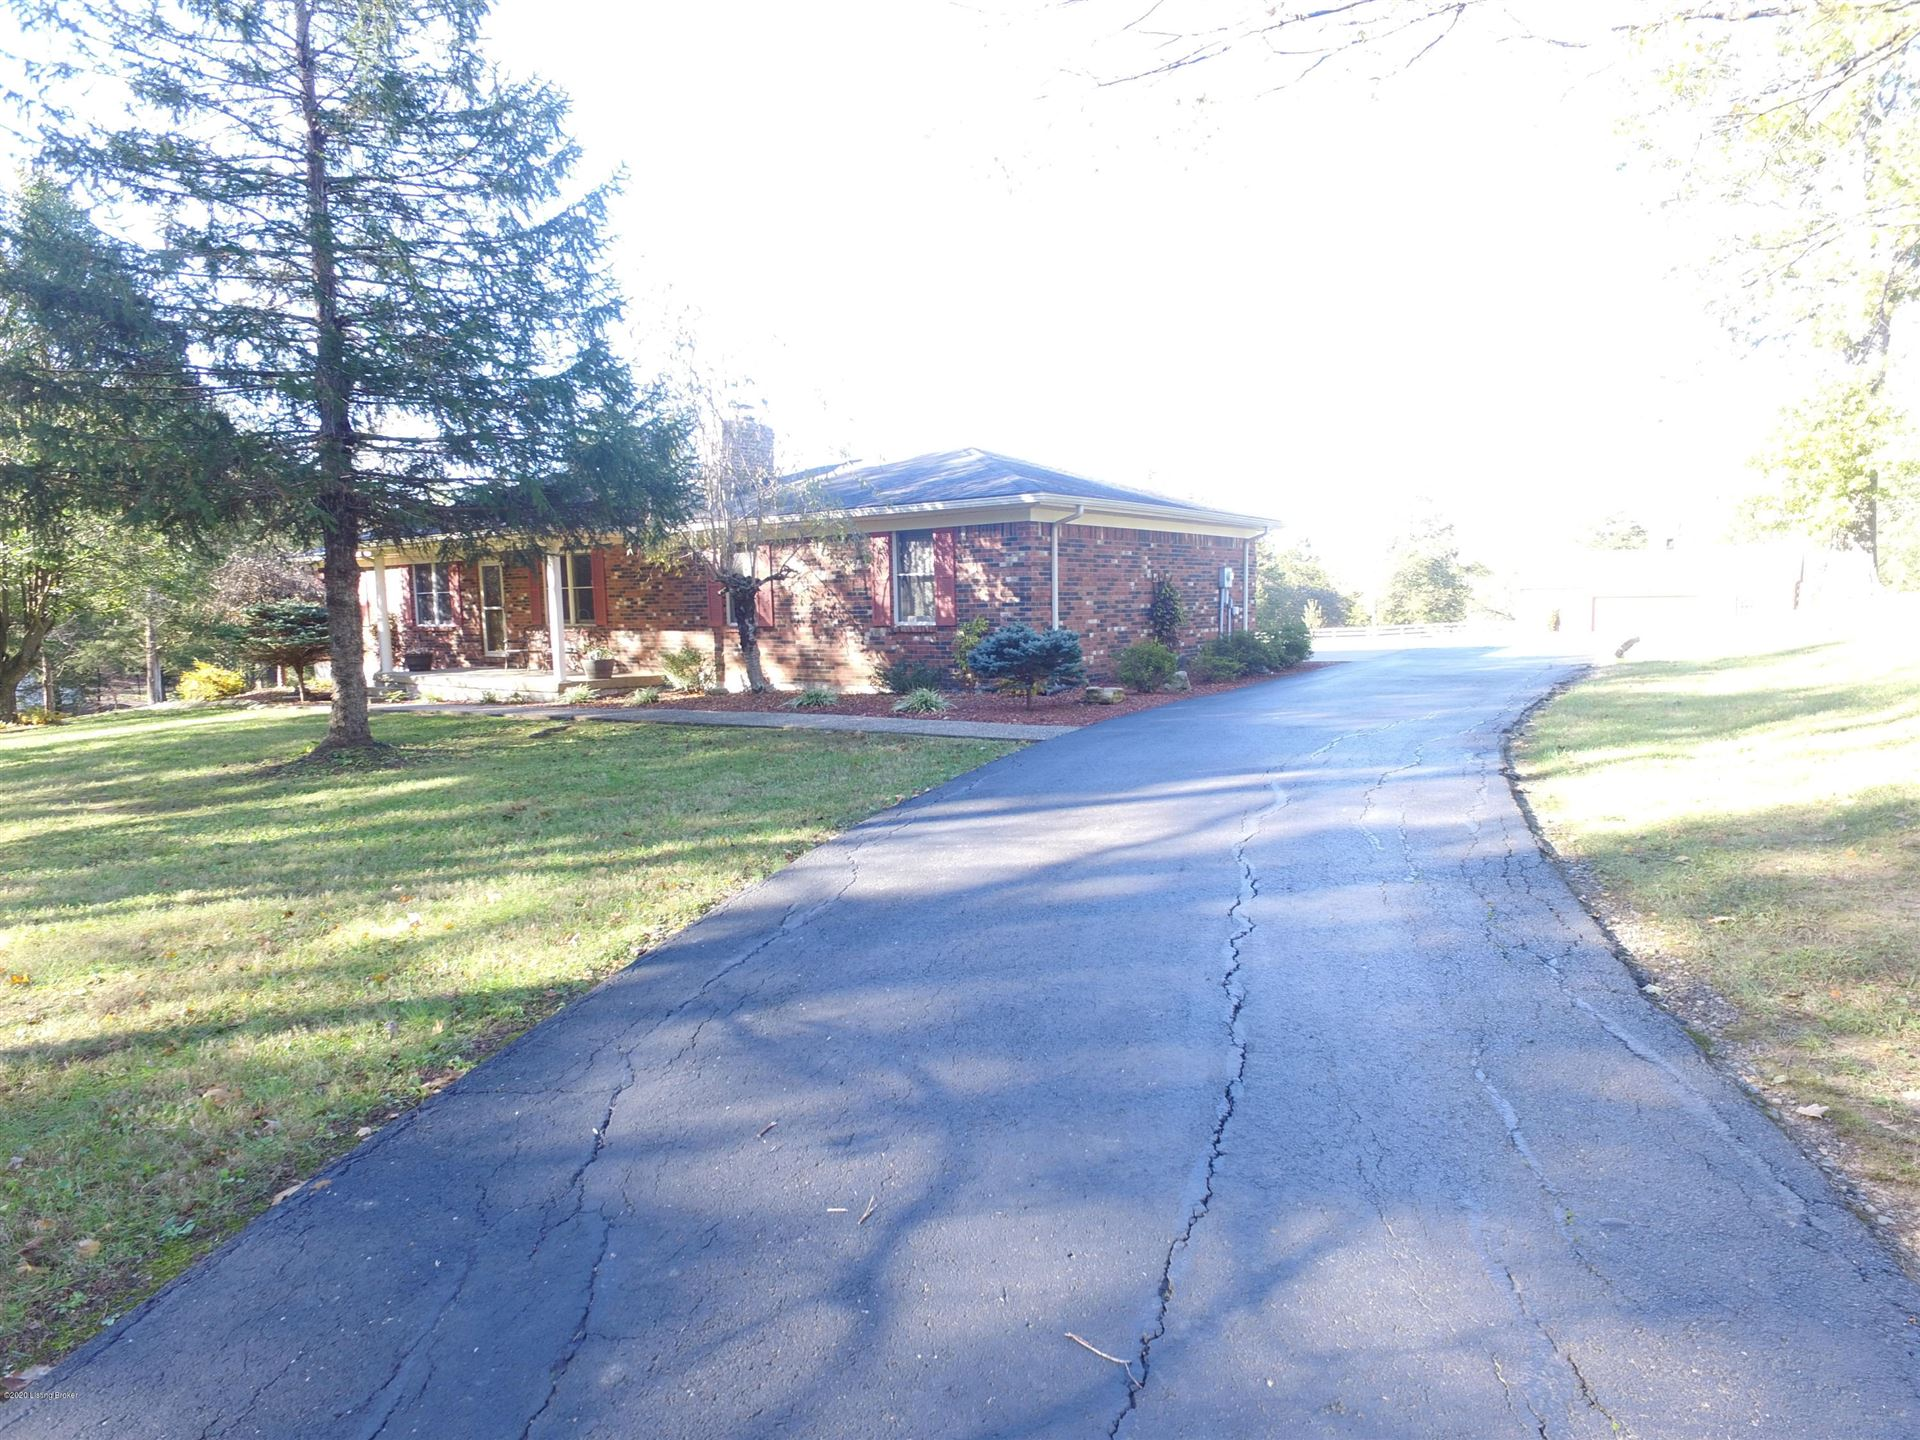 Photo of 585 Johnson Ln, Taylorsville, KY 40071 (MLS # 1573159)